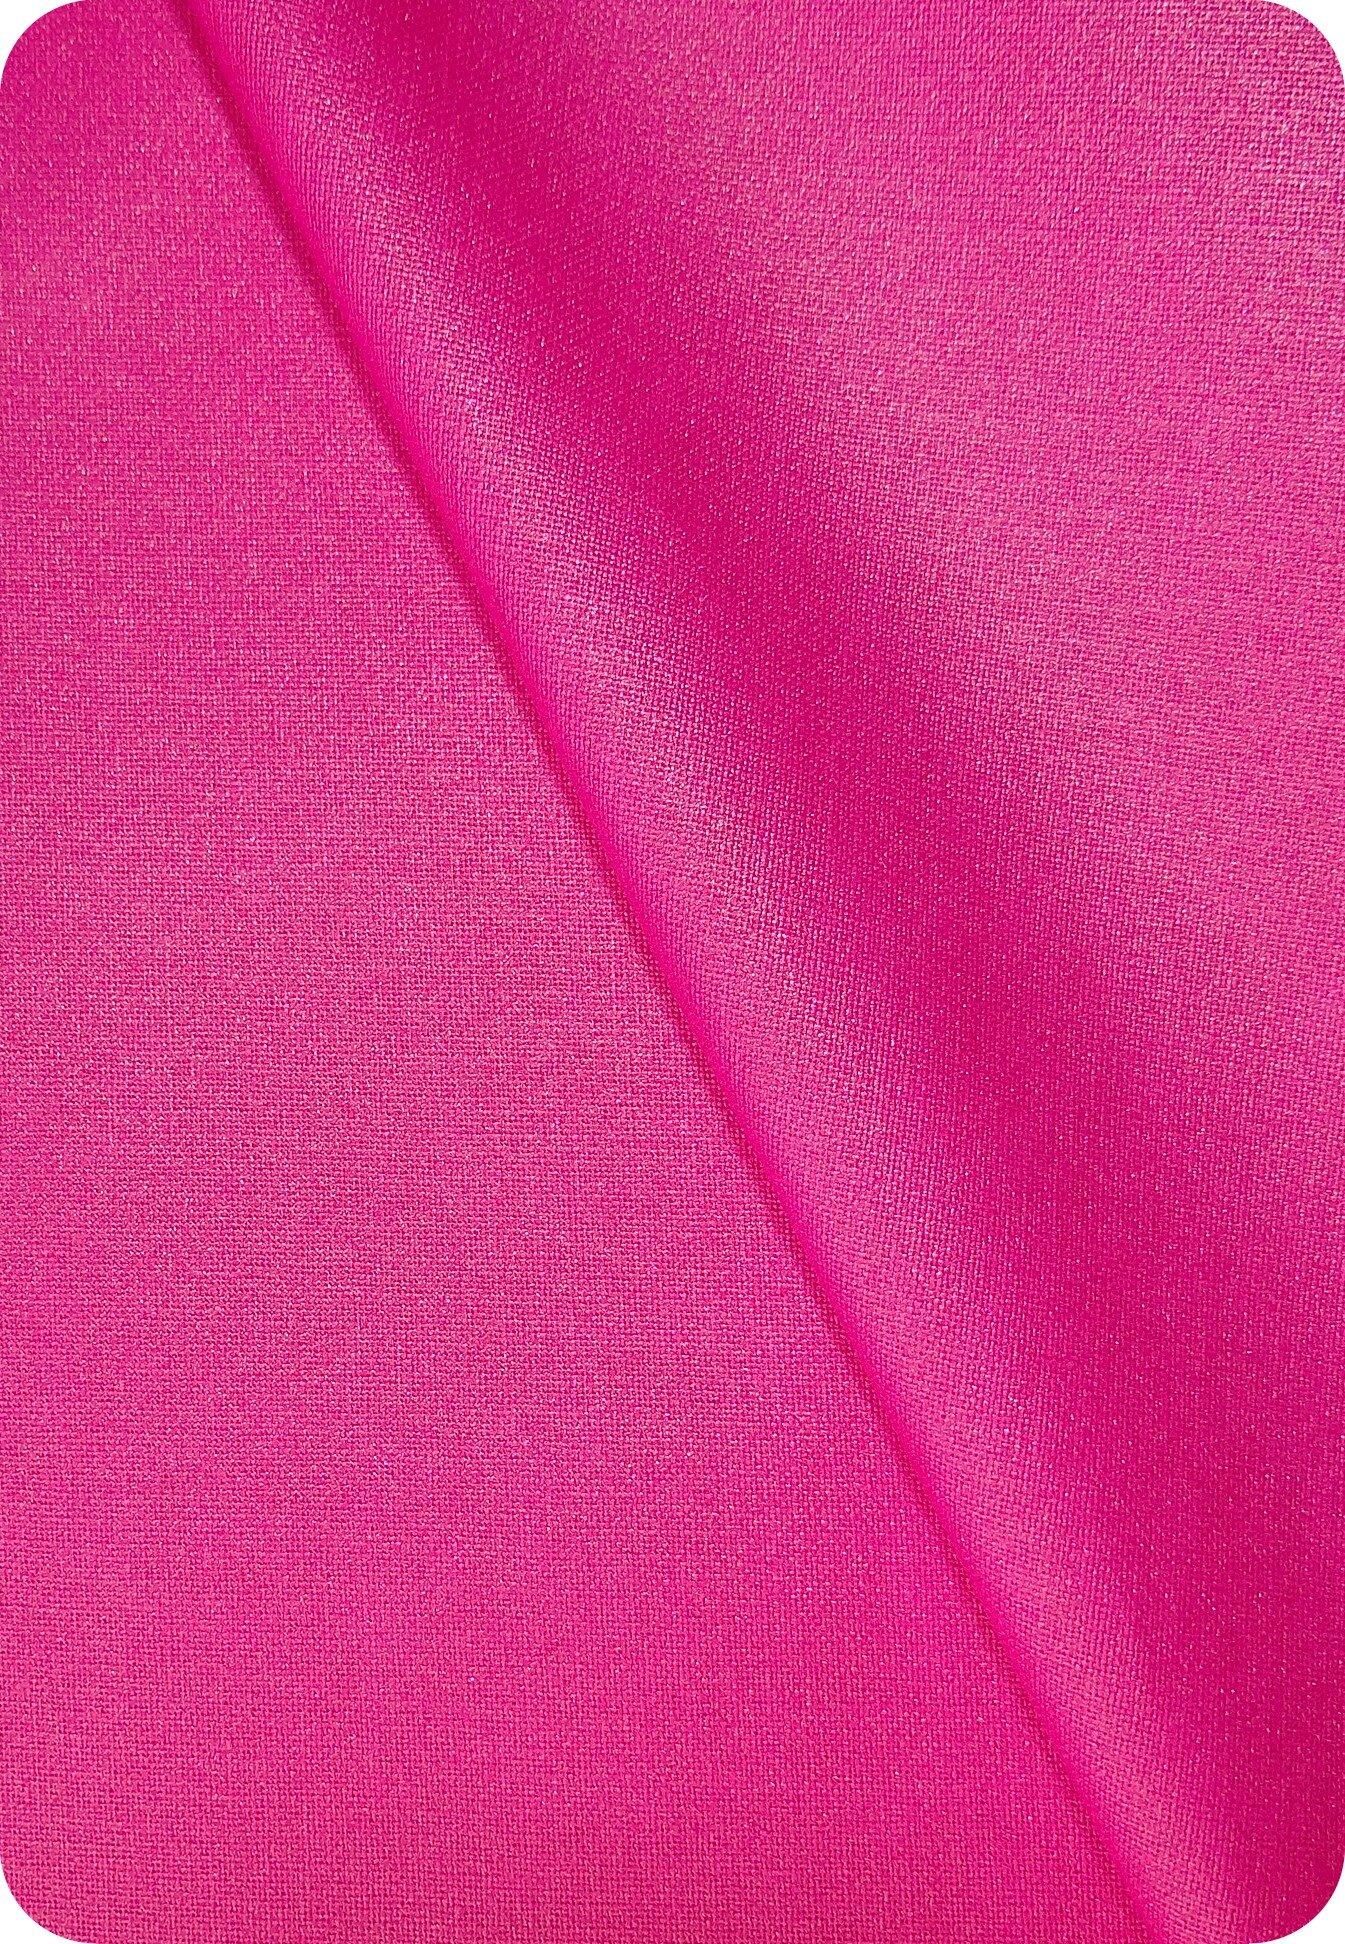 Tissu enduit rose fuchsia